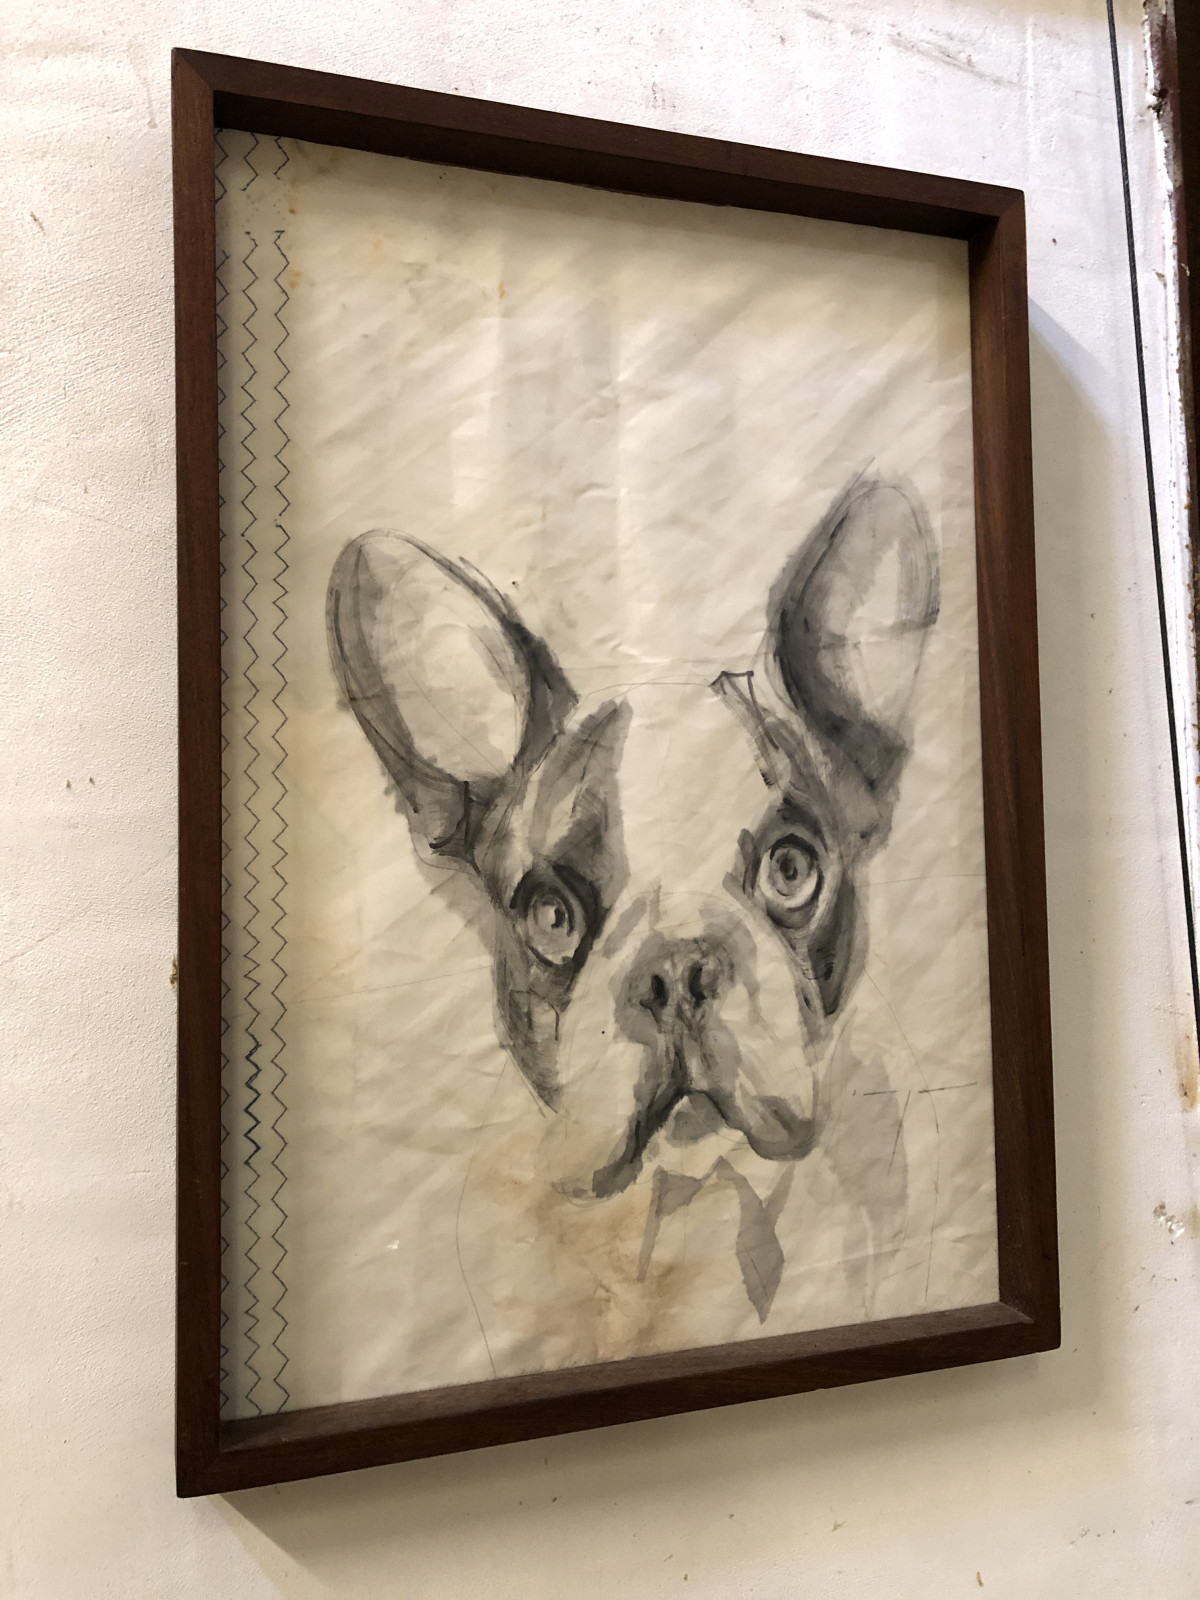 French Bulldog Puppy Dog on Sail